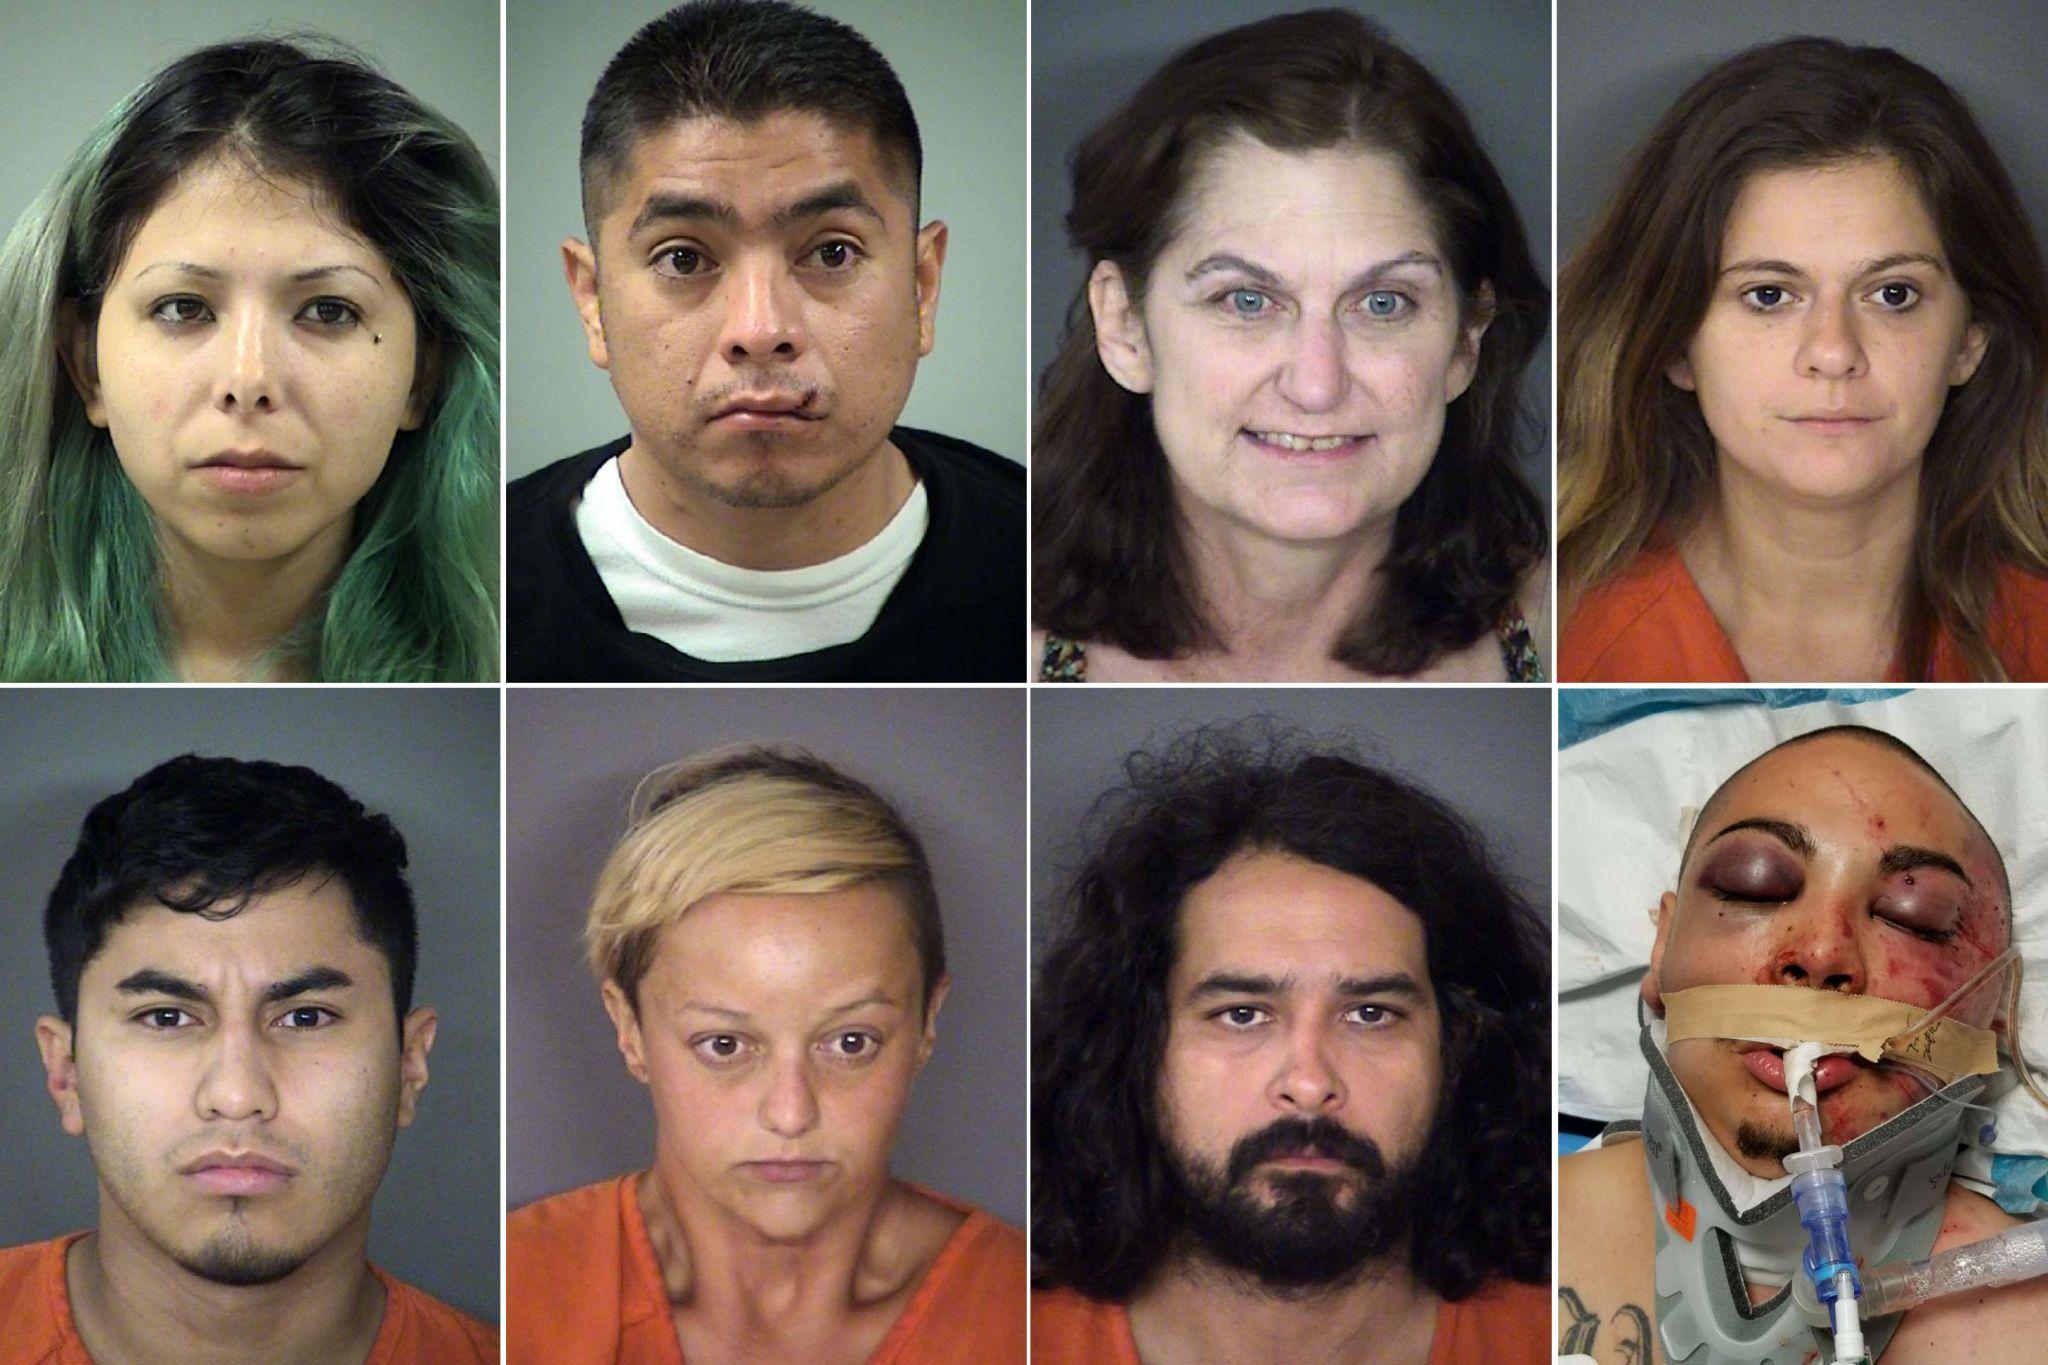 July 2017 Dwi Arrests San Antonio Express News